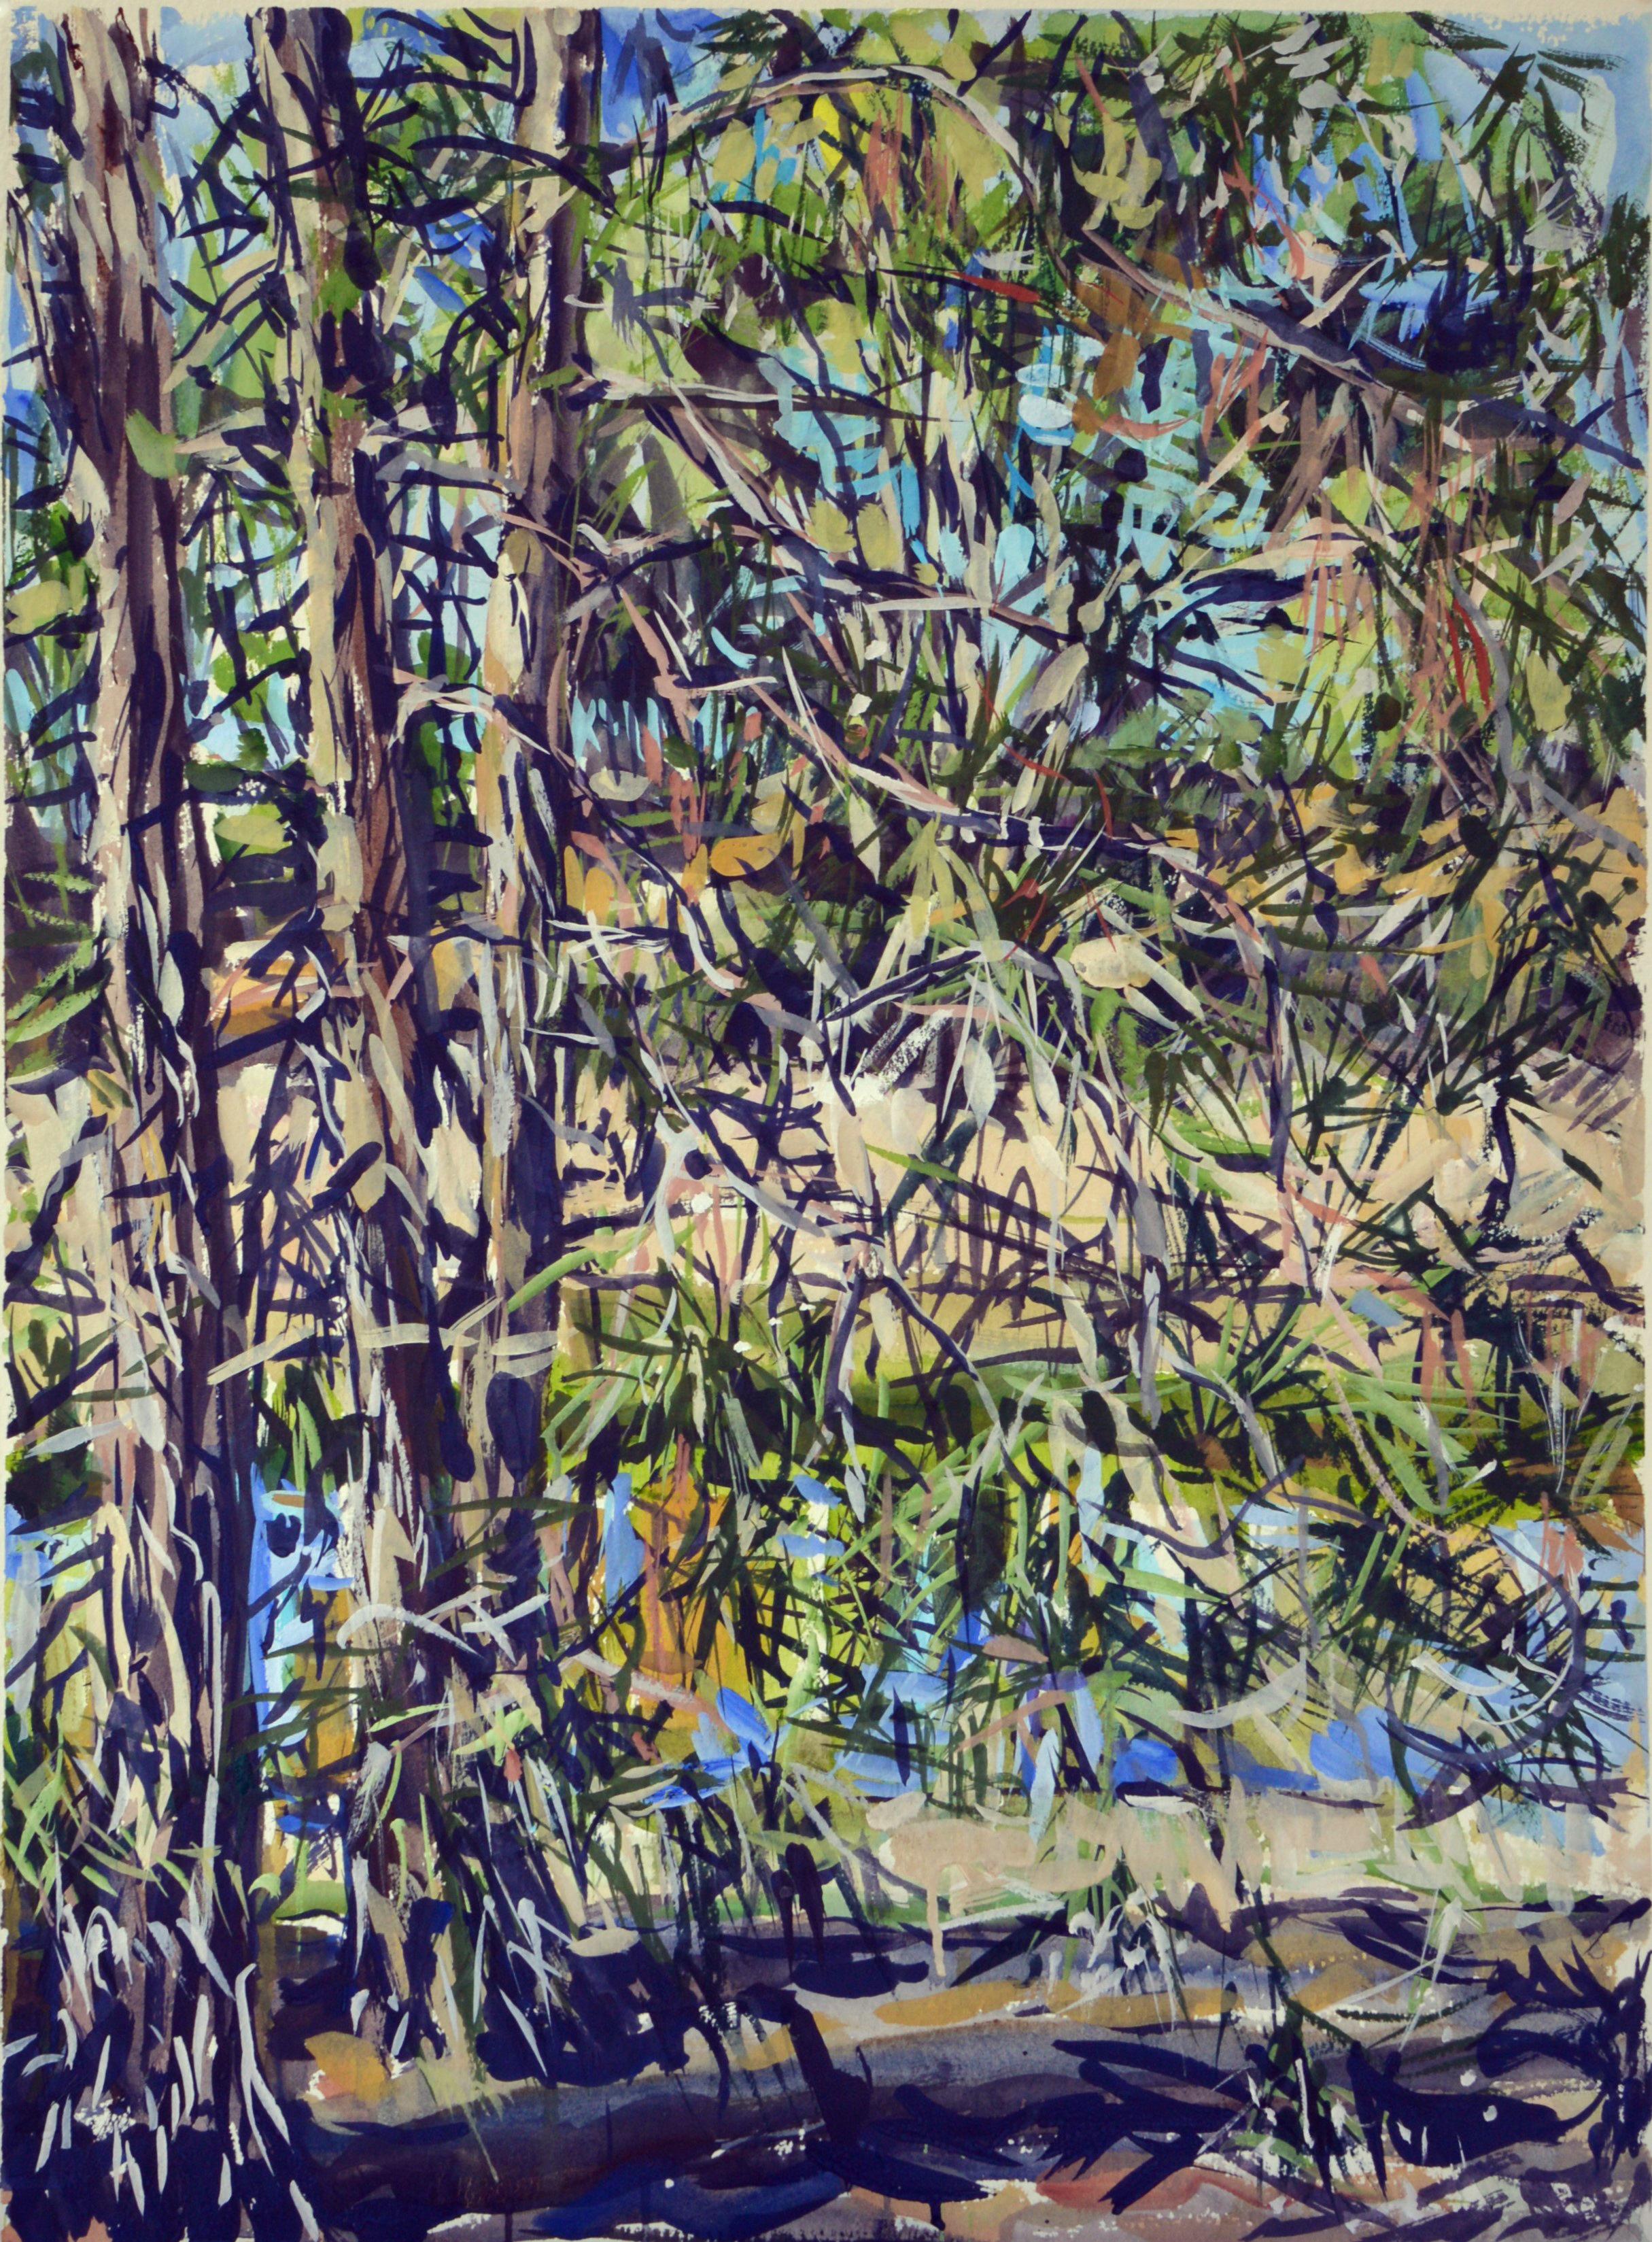 Brigalow Creek Midday (Belah Tree) 2018 gouache on rag paper 76 x 54cm